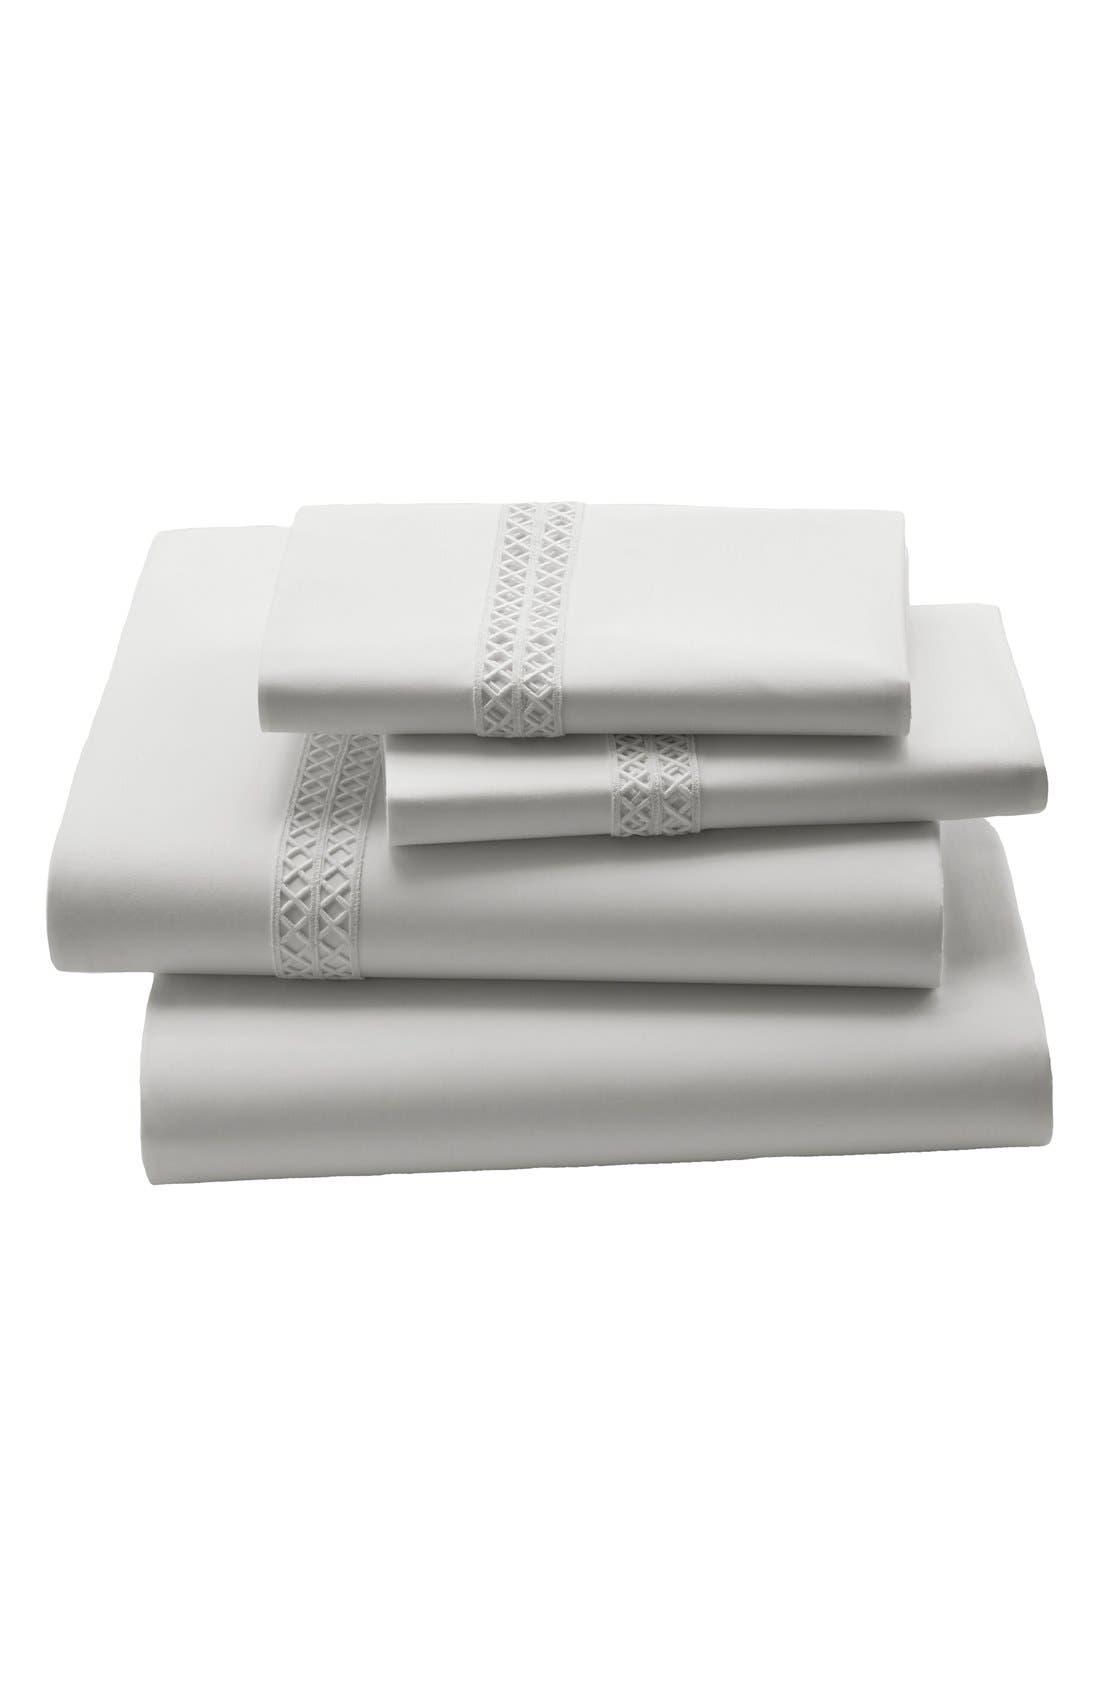 Main Image - KASSATEX Emilia 210 Thread Count Fitted Sheet